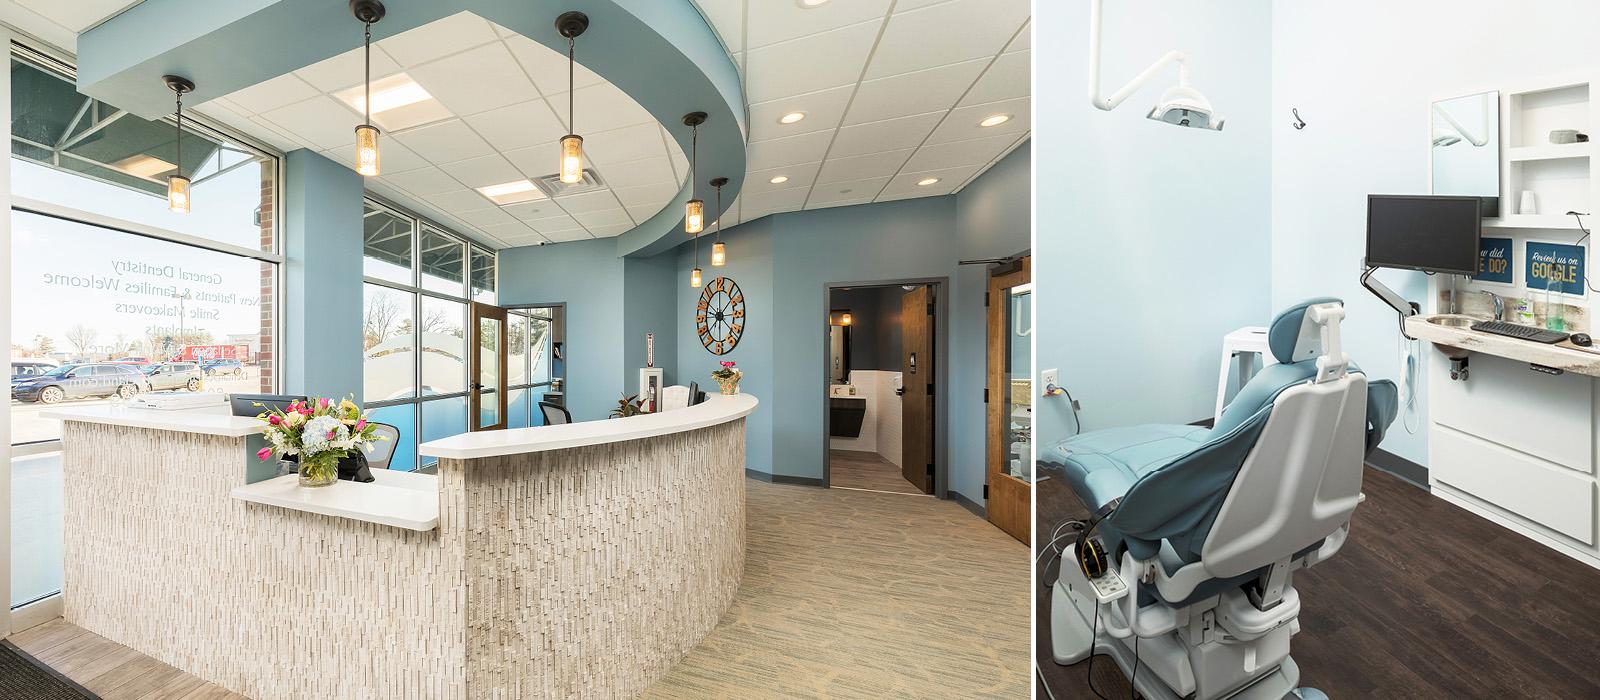 Dental Design of New England reception desk and treatment room